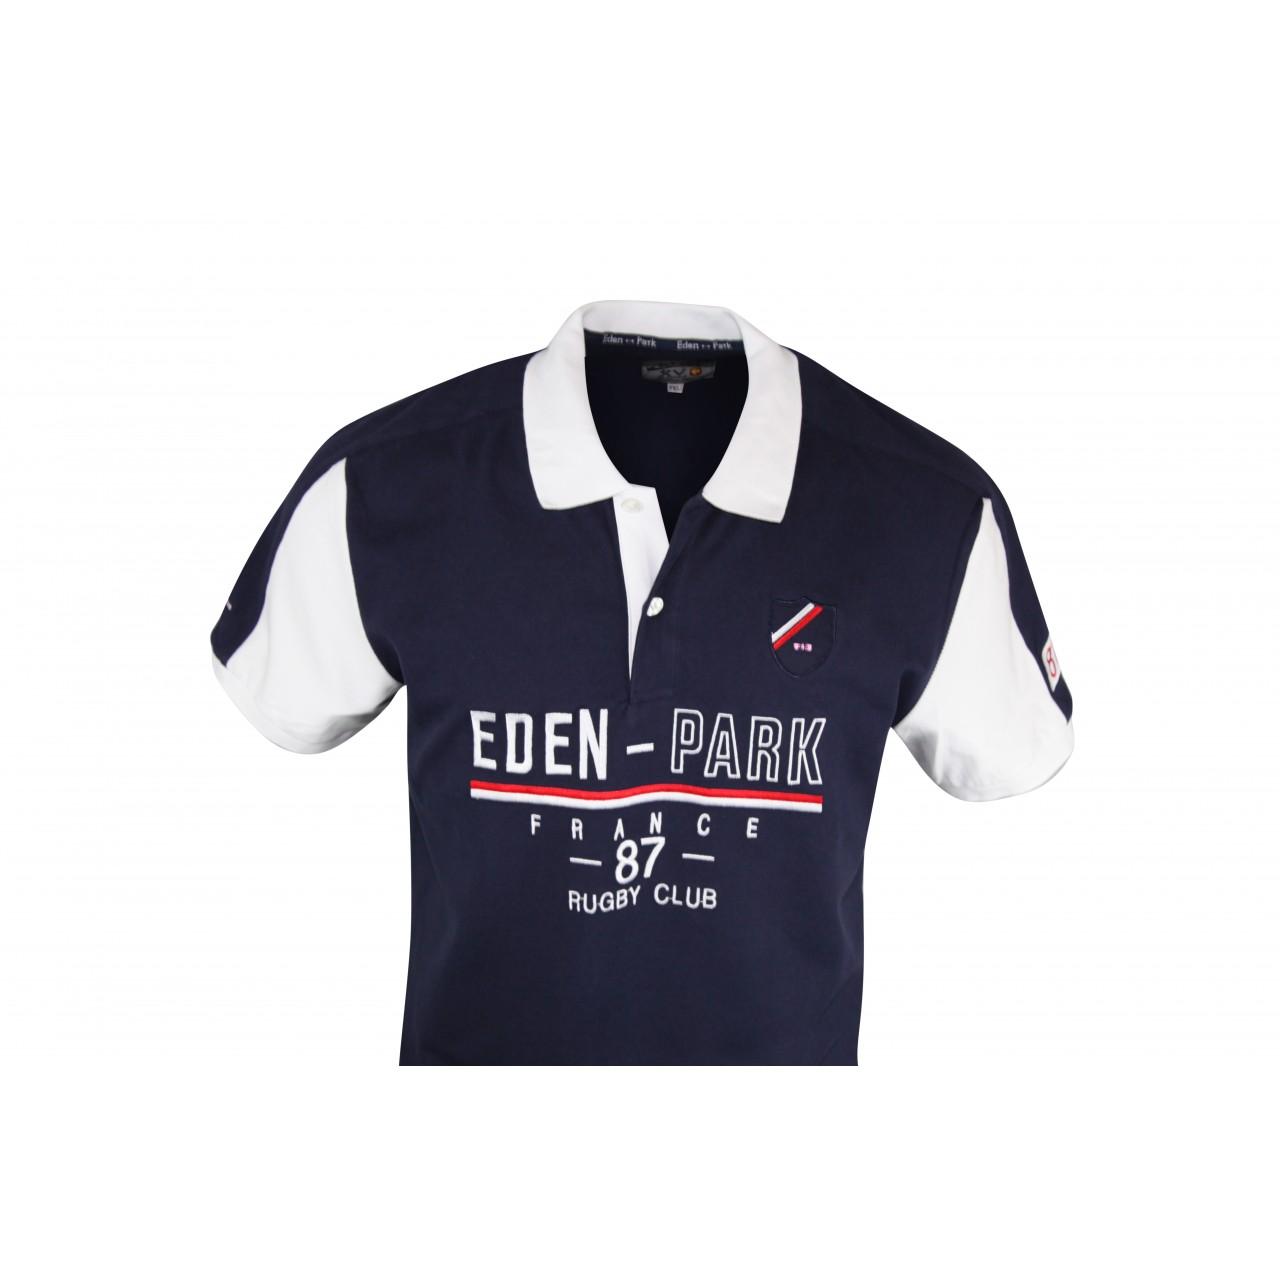 EDEN - PARK Navy Blue Men's Collared Shirt